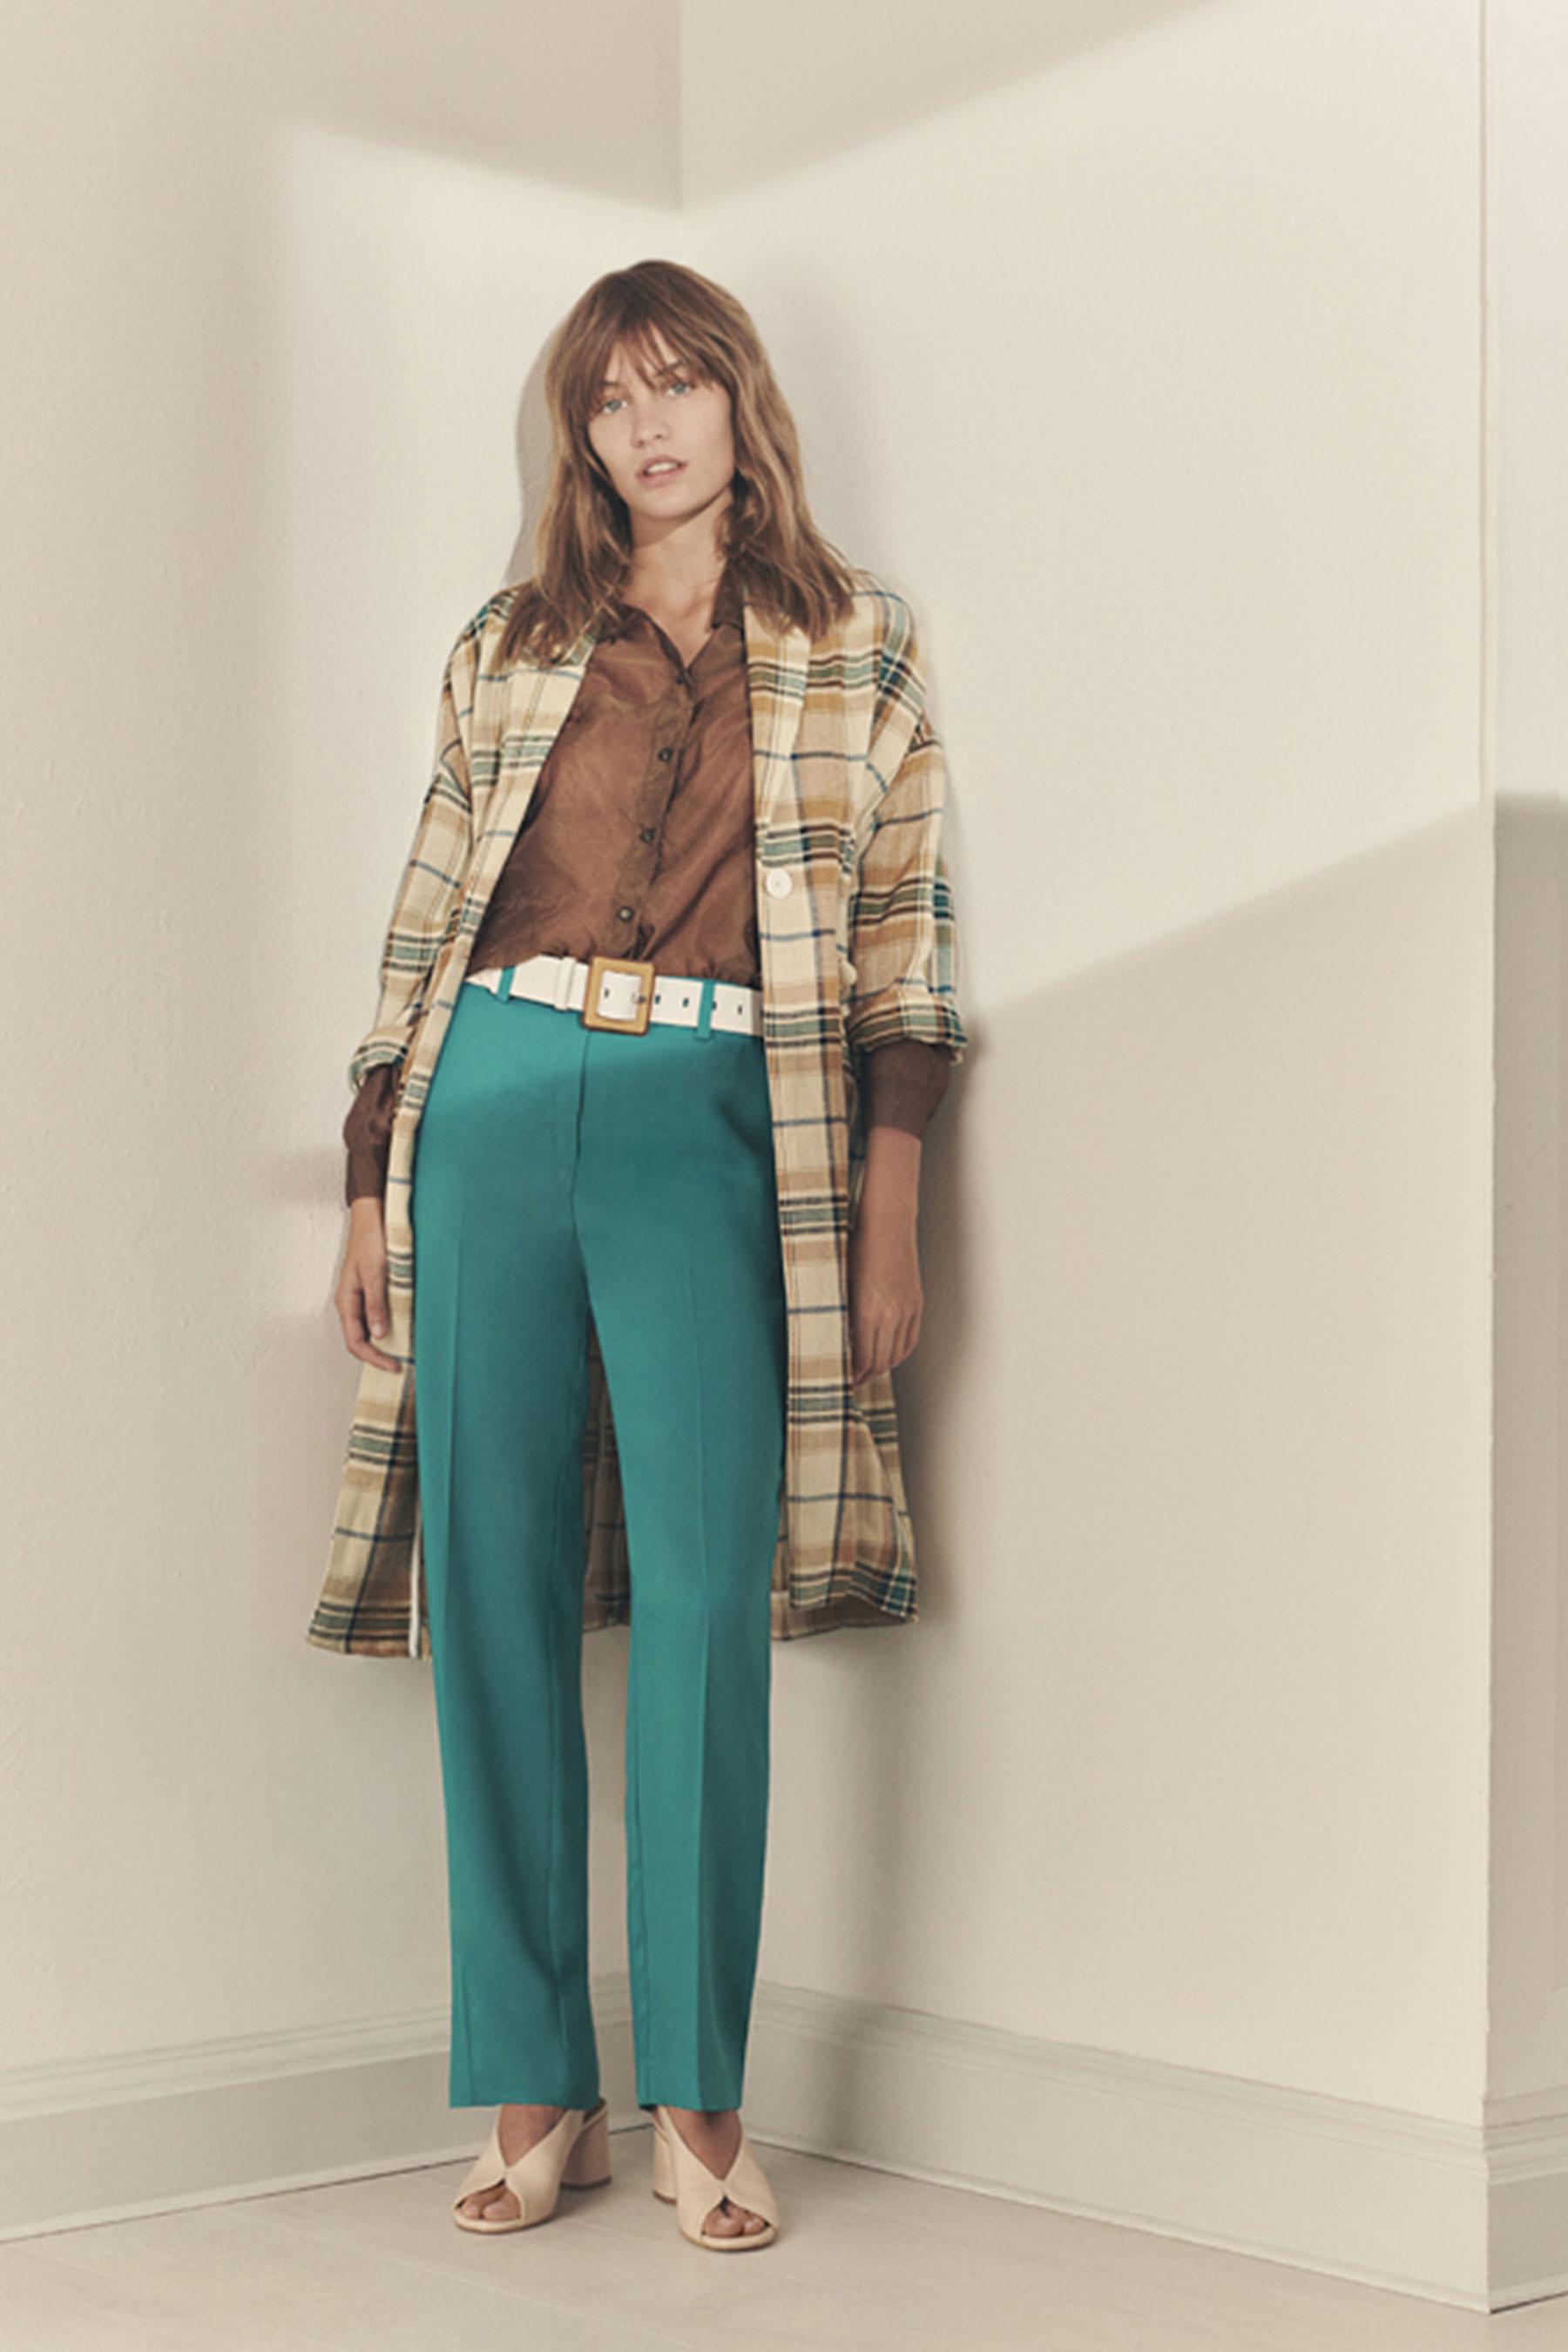 Oversized coat, unlined in check pattern MOMONI | Coat | MOCO005 19MO7032